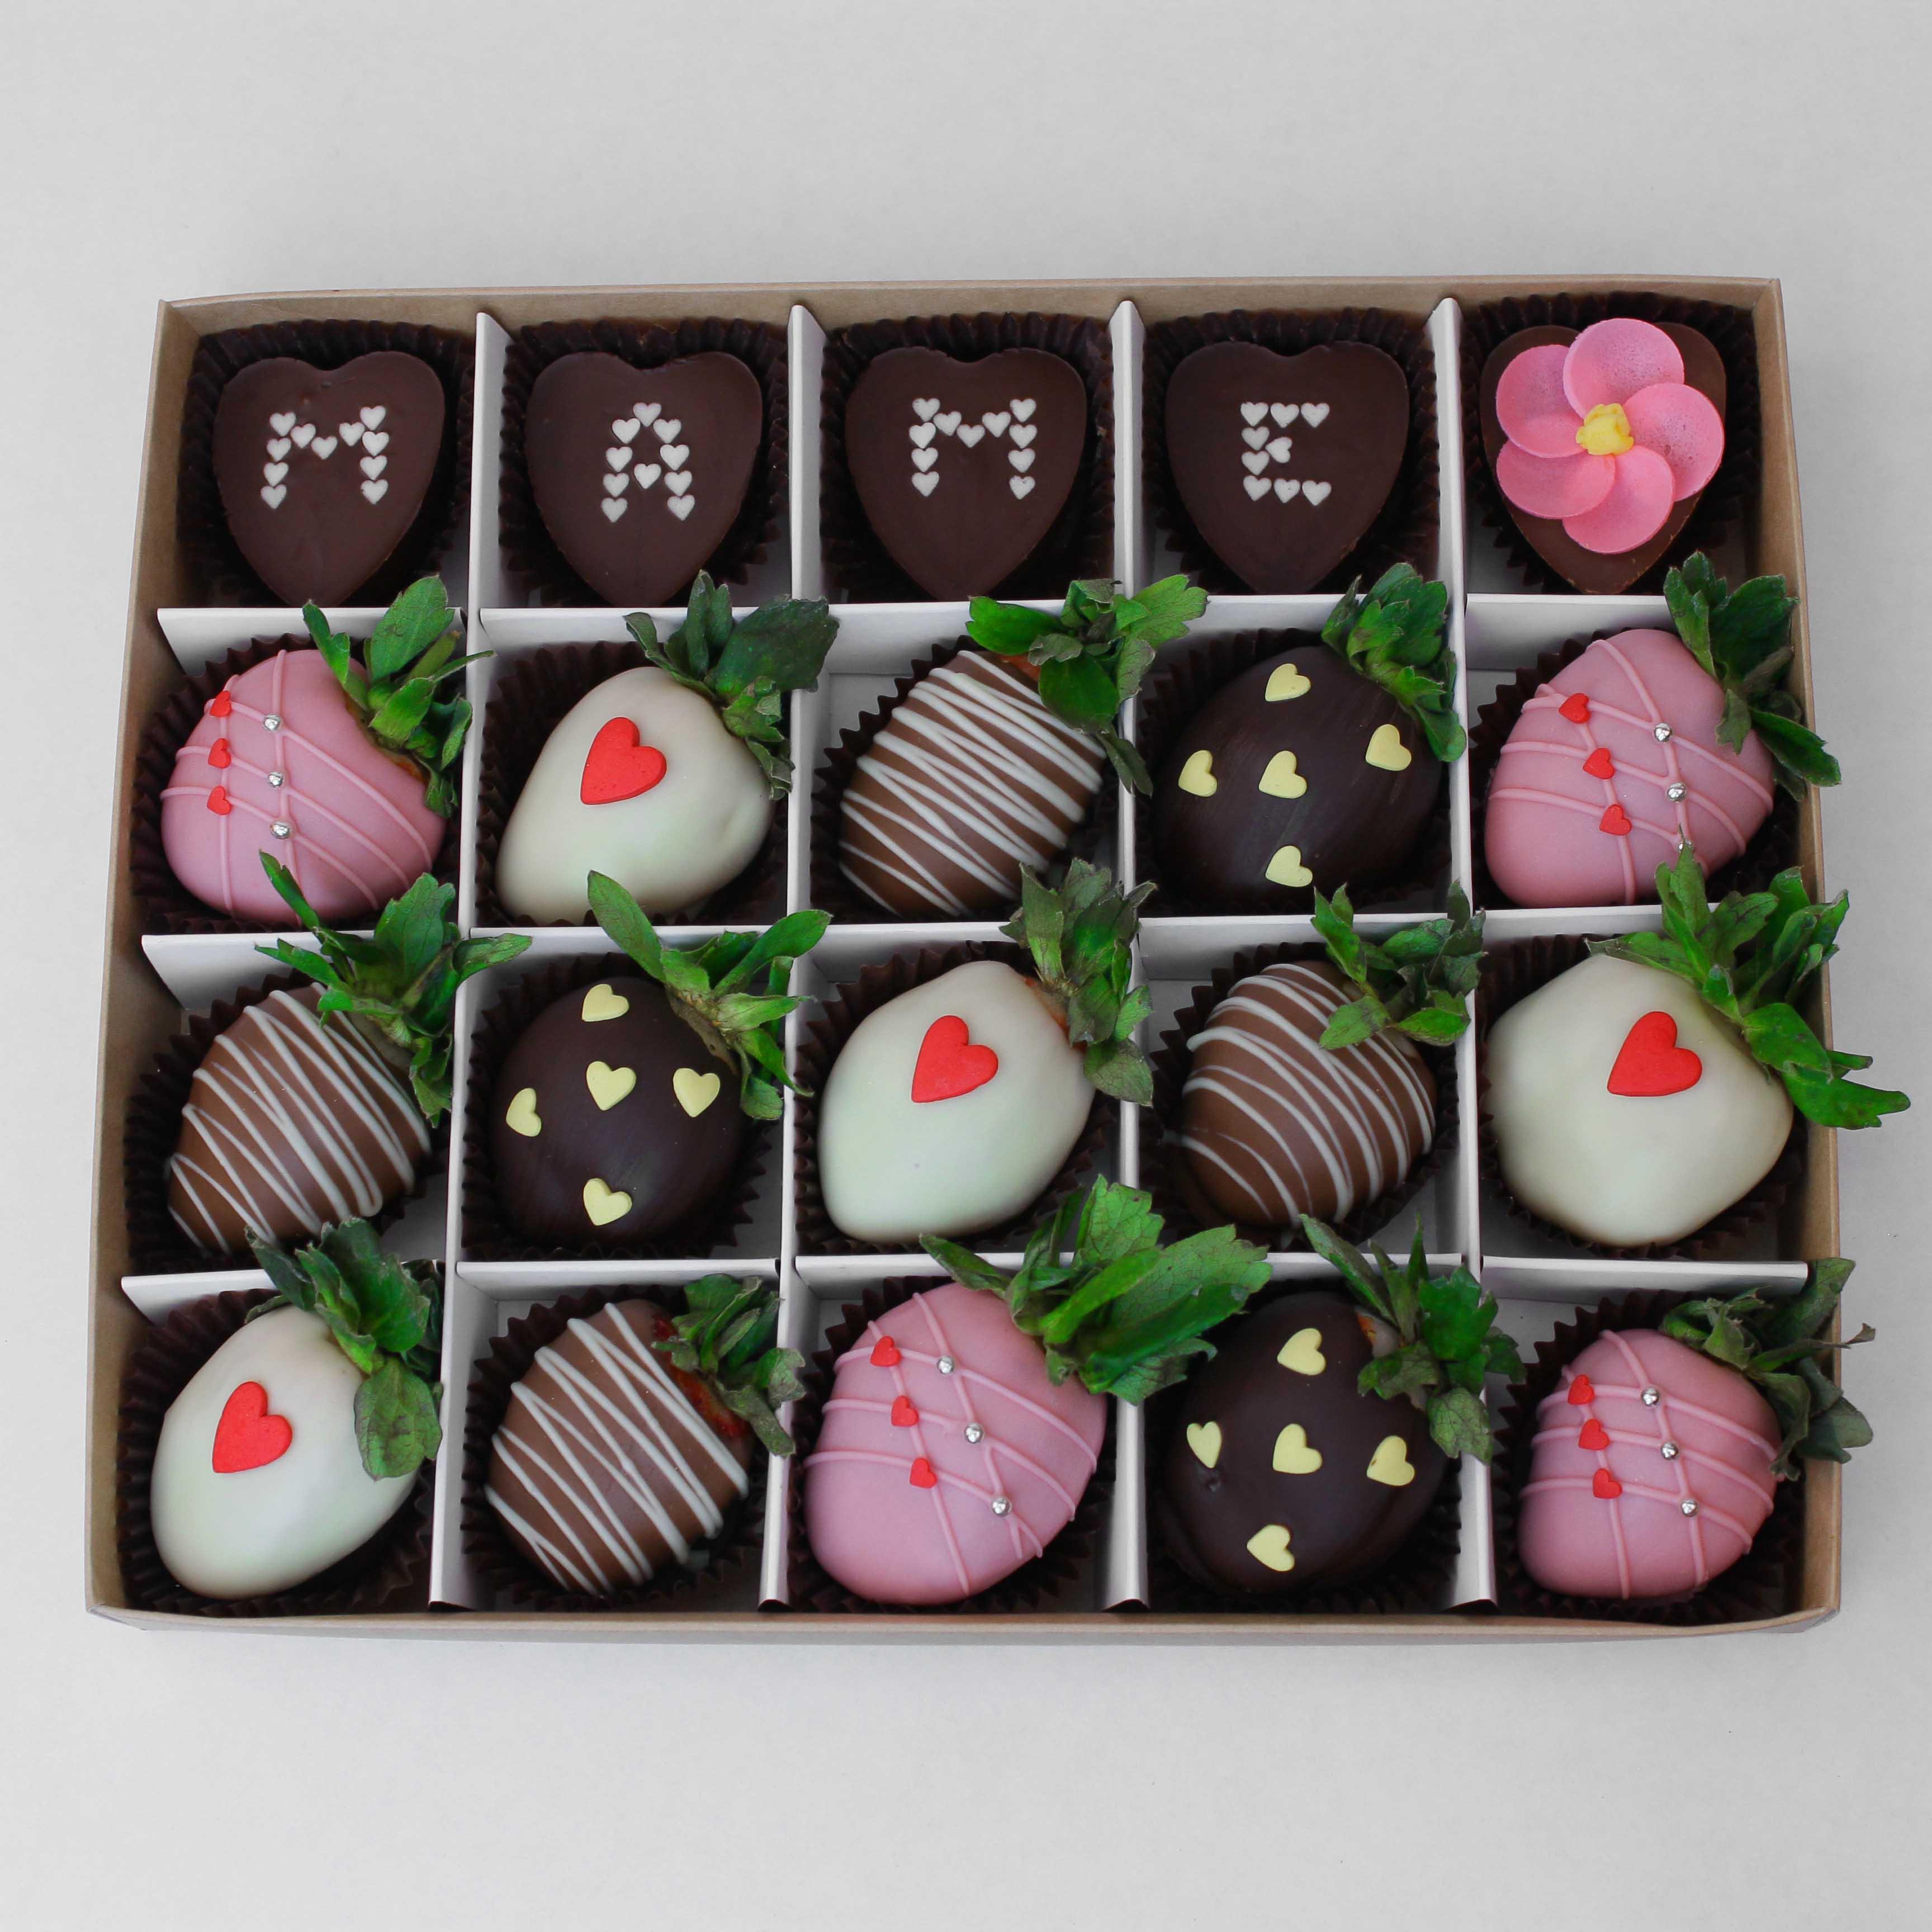 Набор клубники в шоколаде с конфетами №2